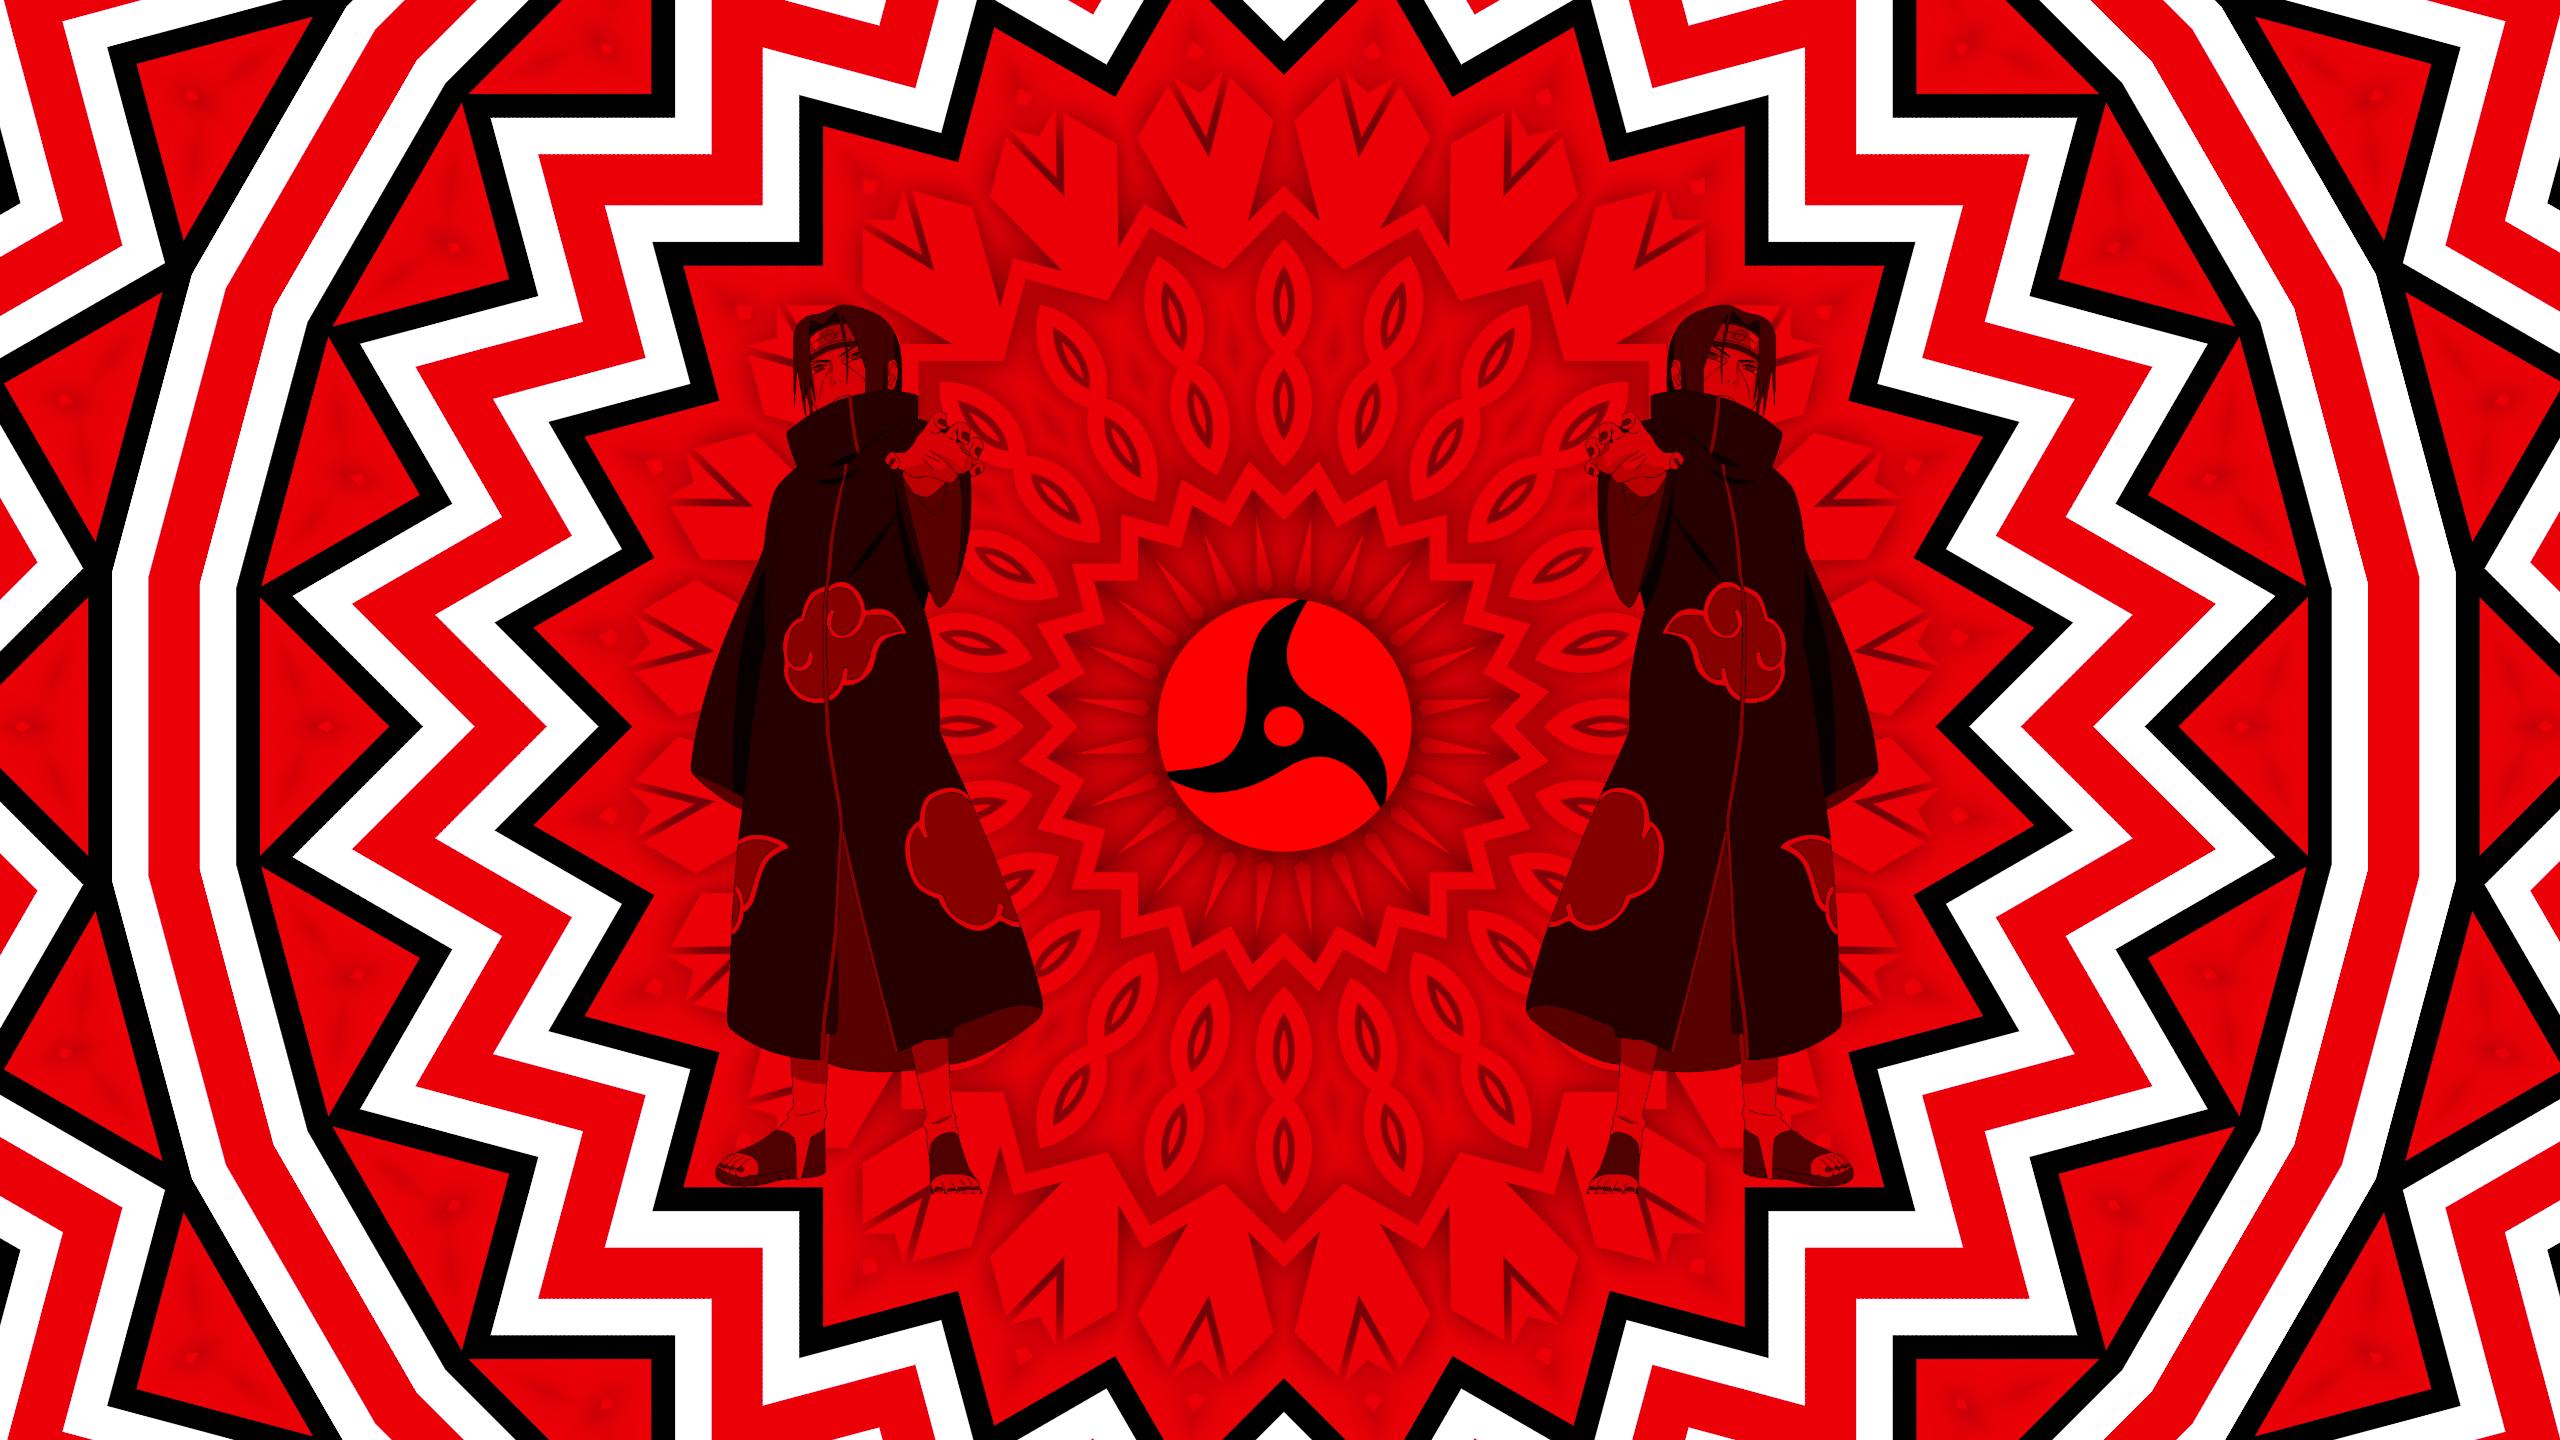 Itachi Uchiha And The Sharingan Hd Wallpaper Background Image 2560x1440 Id 1011194 Wallpaper Abyss